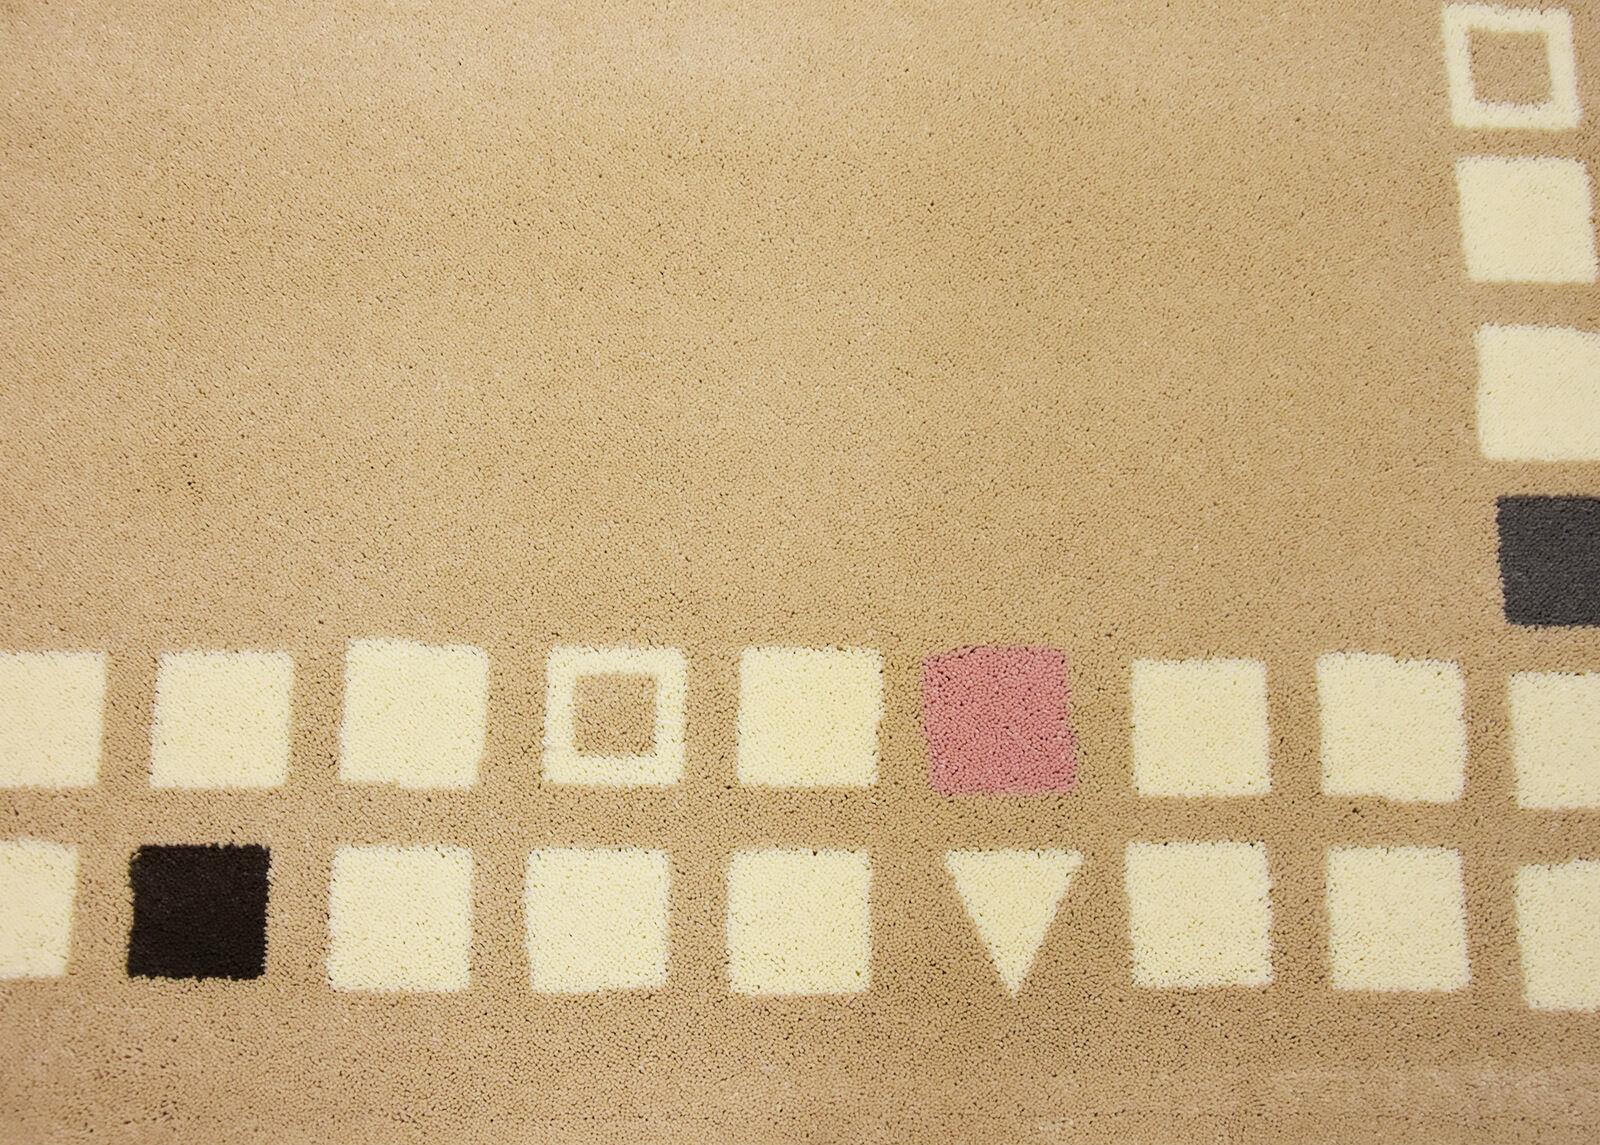 Image of Moldabela Matto 160x230 cm